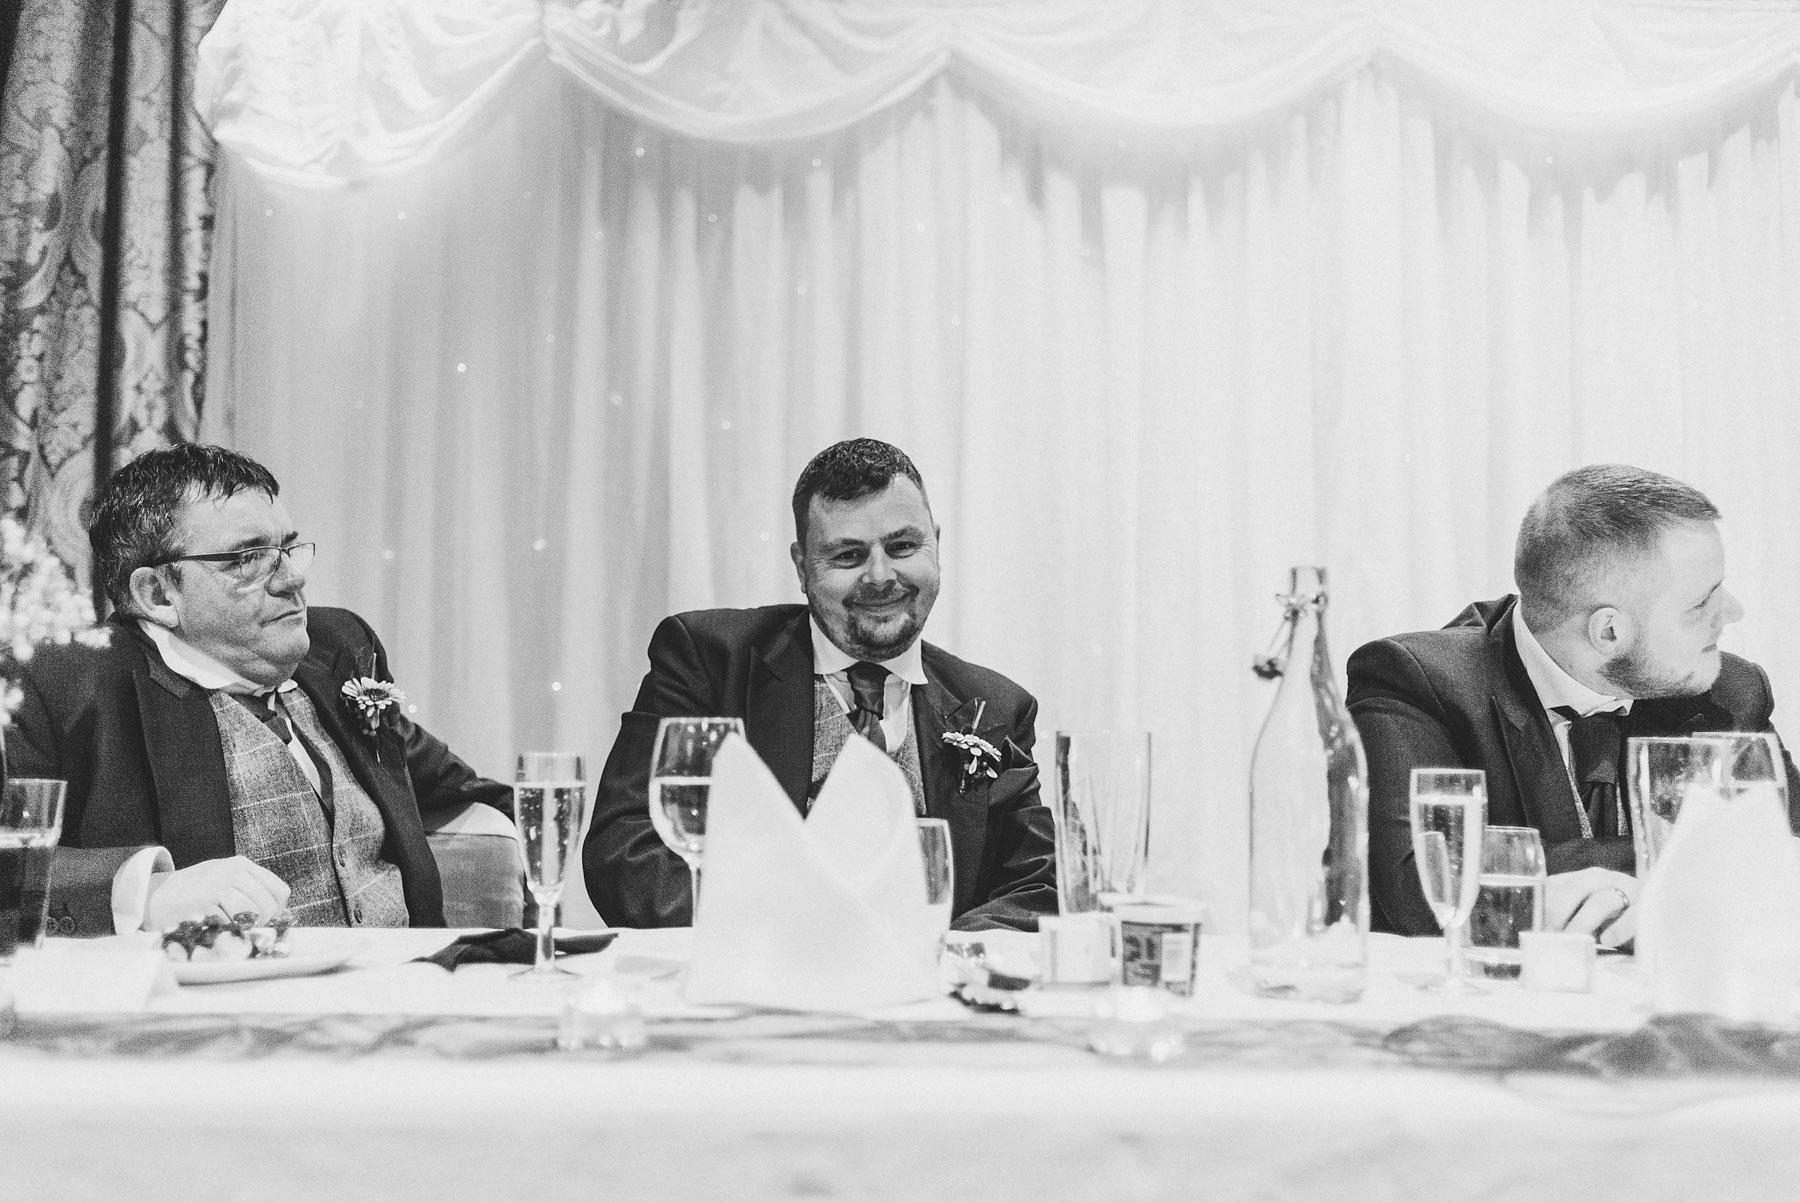 Groom and bestman look on during wedding speeches